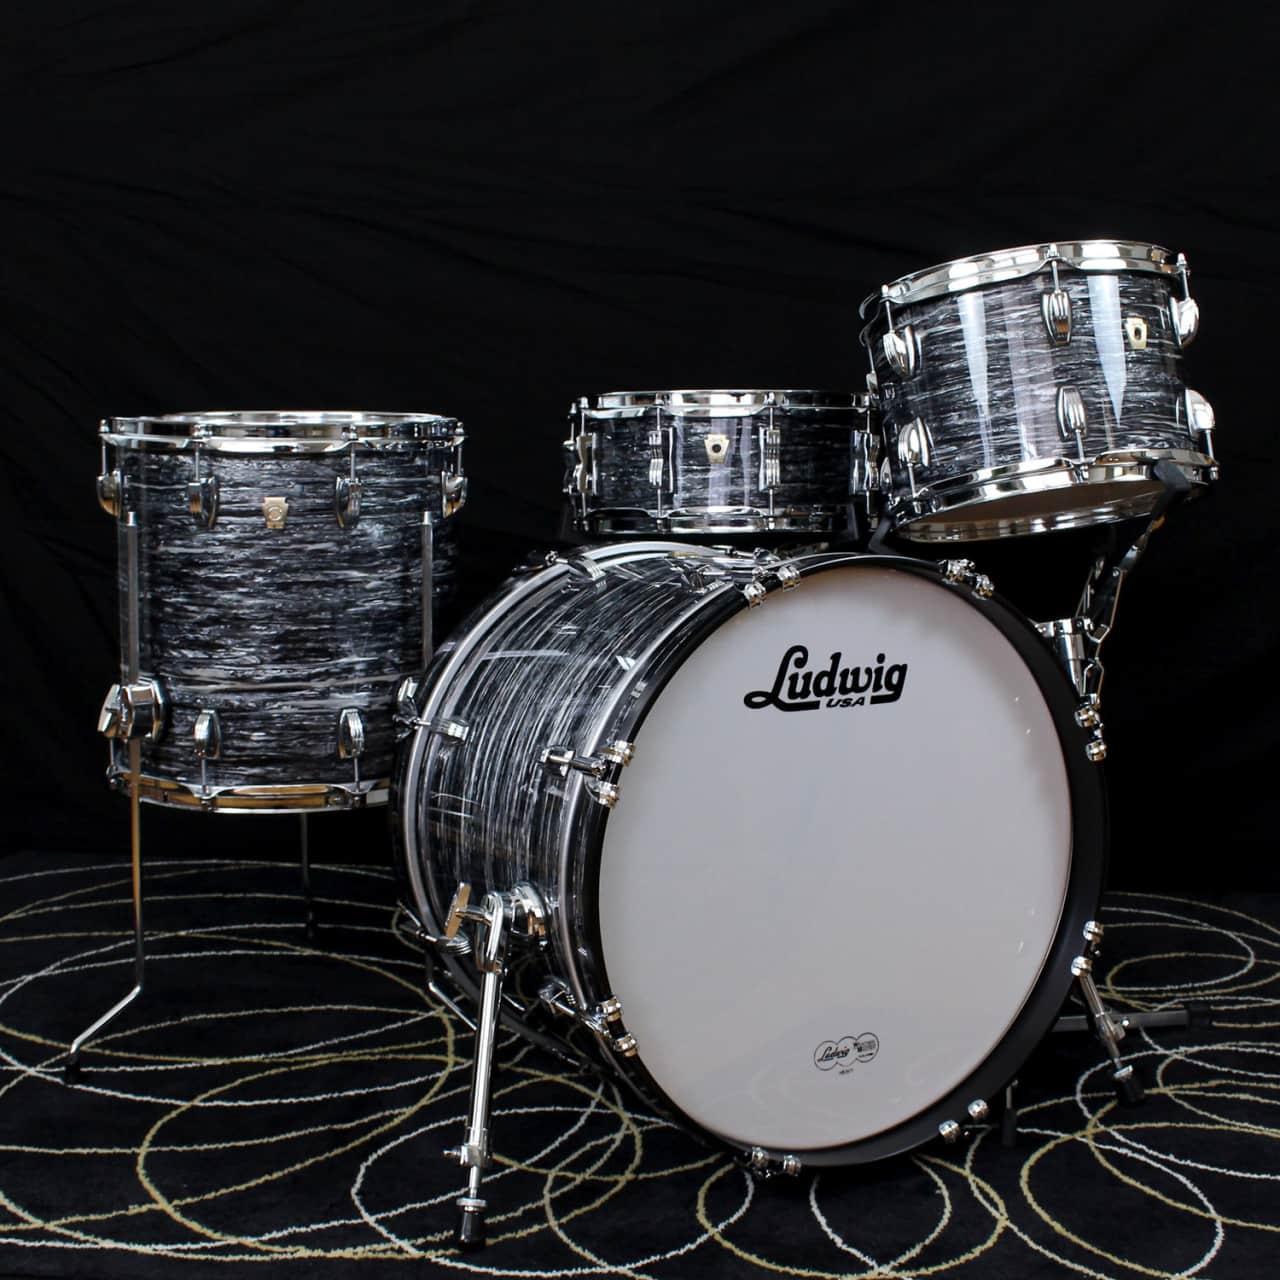 ludwig classic maple downbeat drum set vintage black oyster reverb. Black Bedroom Furniture Sets. Home Design Ideas